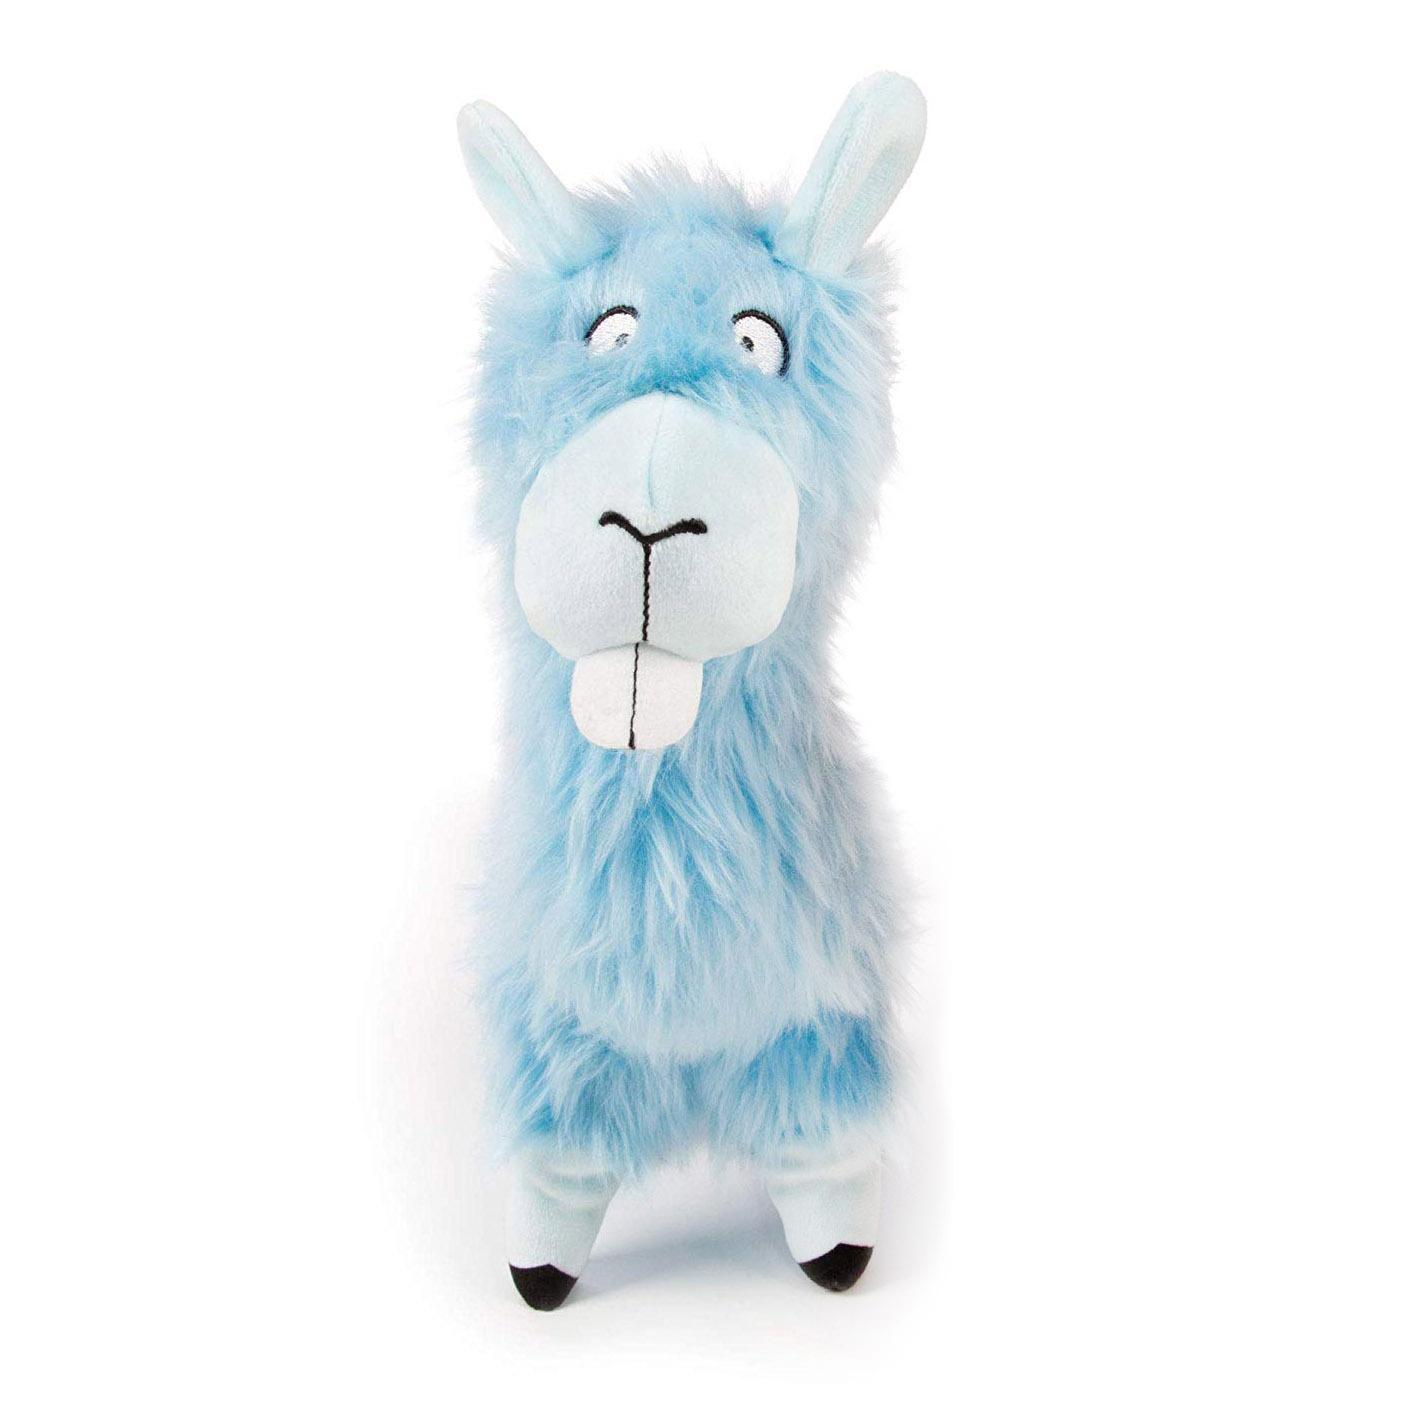 goDog Bucktooth Hairy Llama Plush Dog Toy - Blue